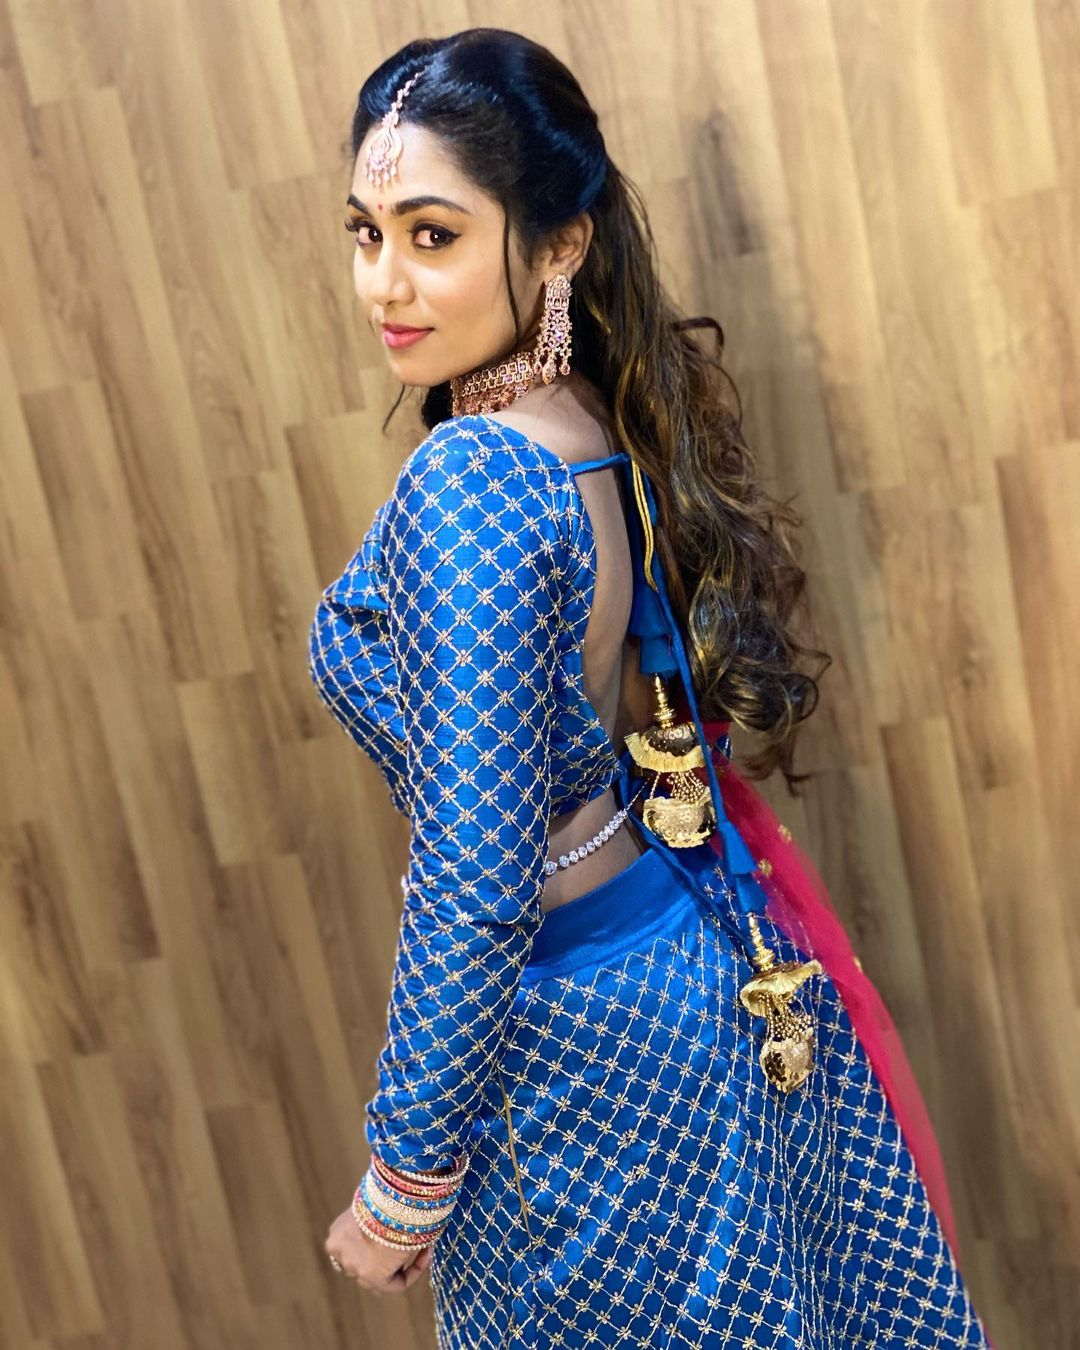 Sreethu Krishnan Photos hd (21)